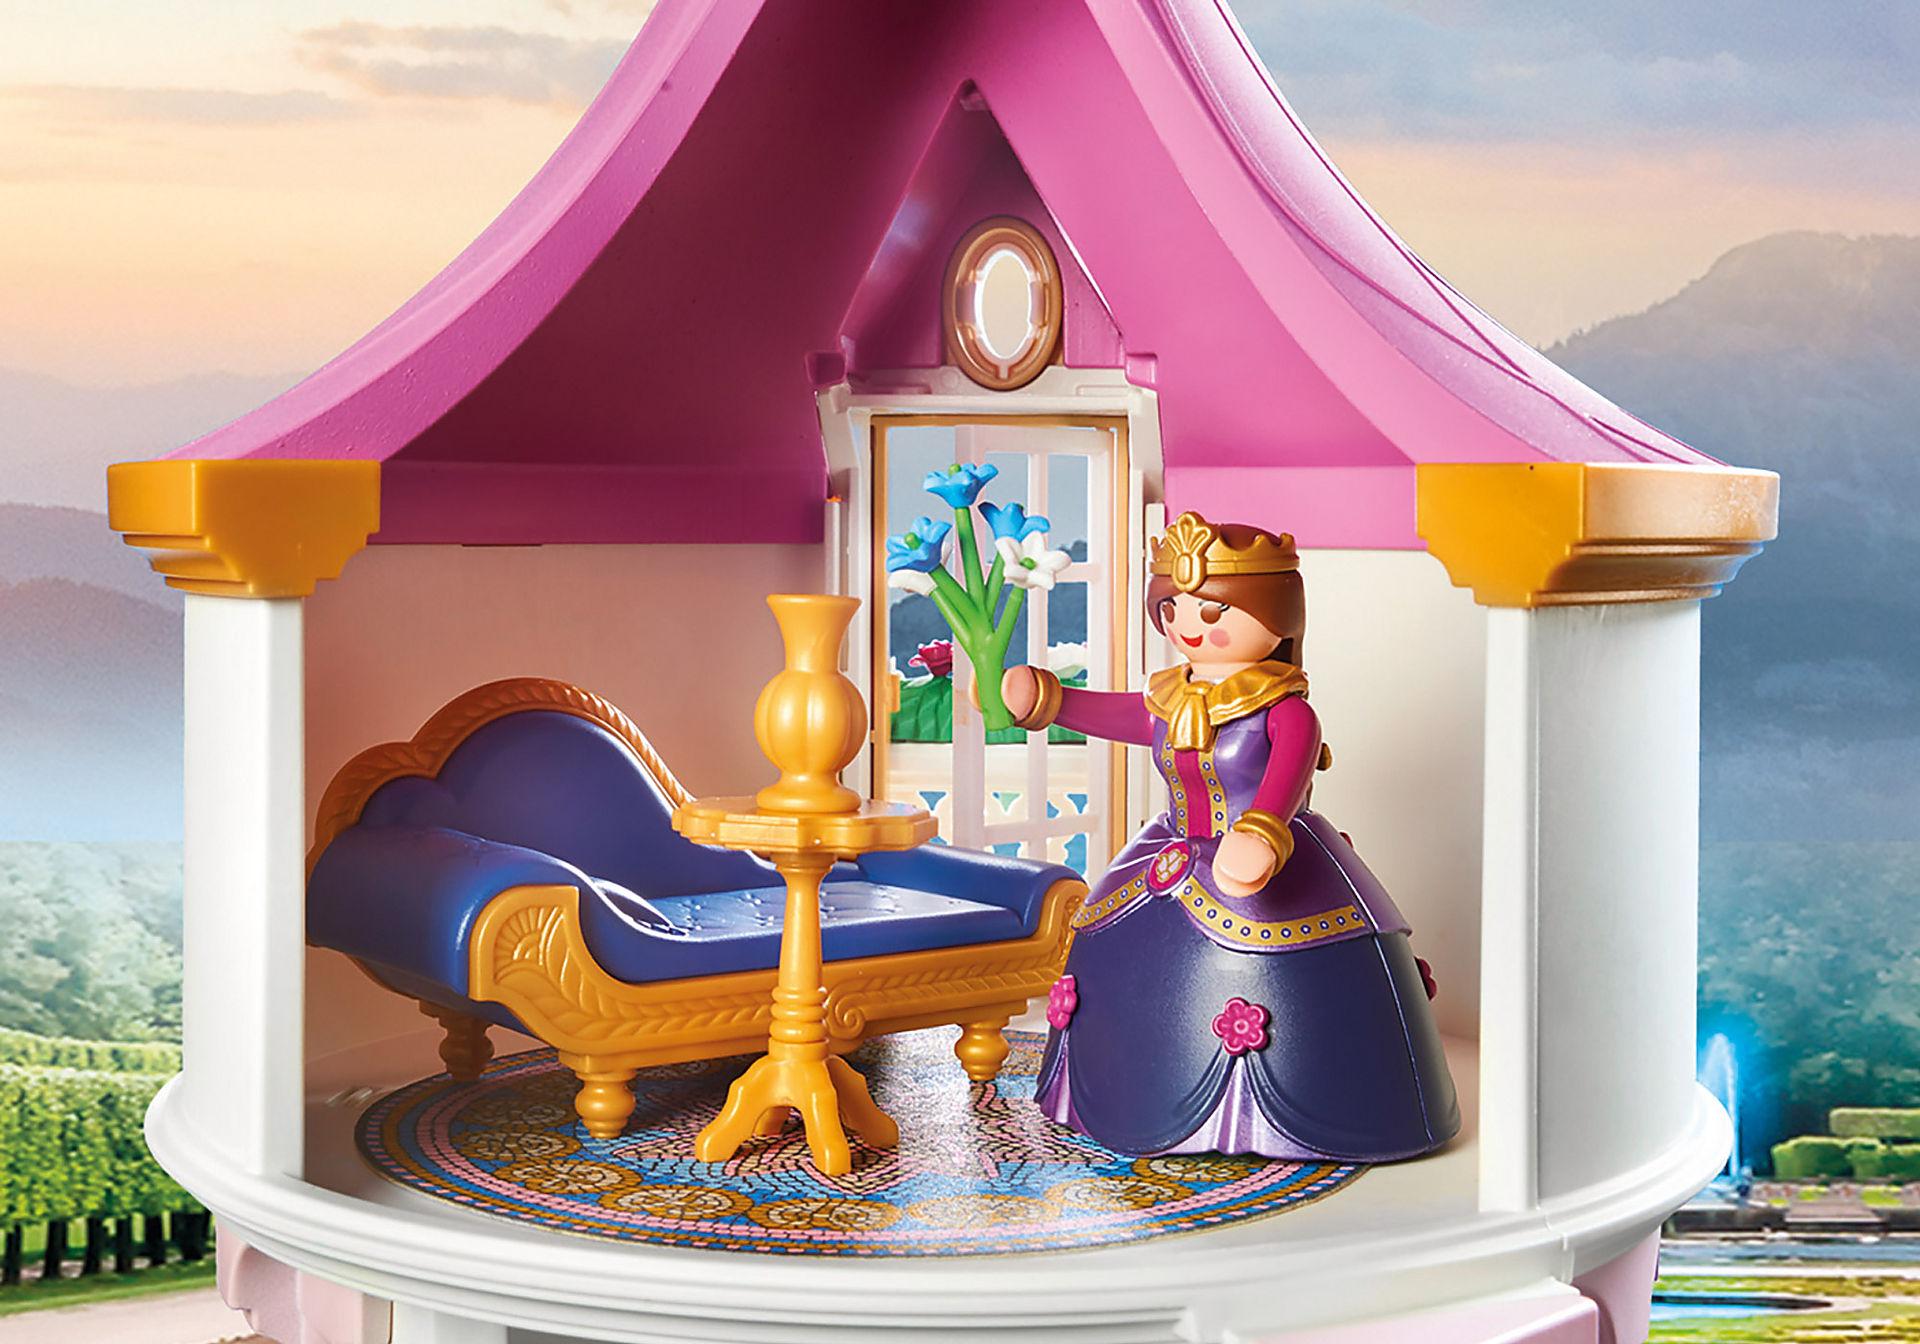 70448 Palais de princesse zoom image7